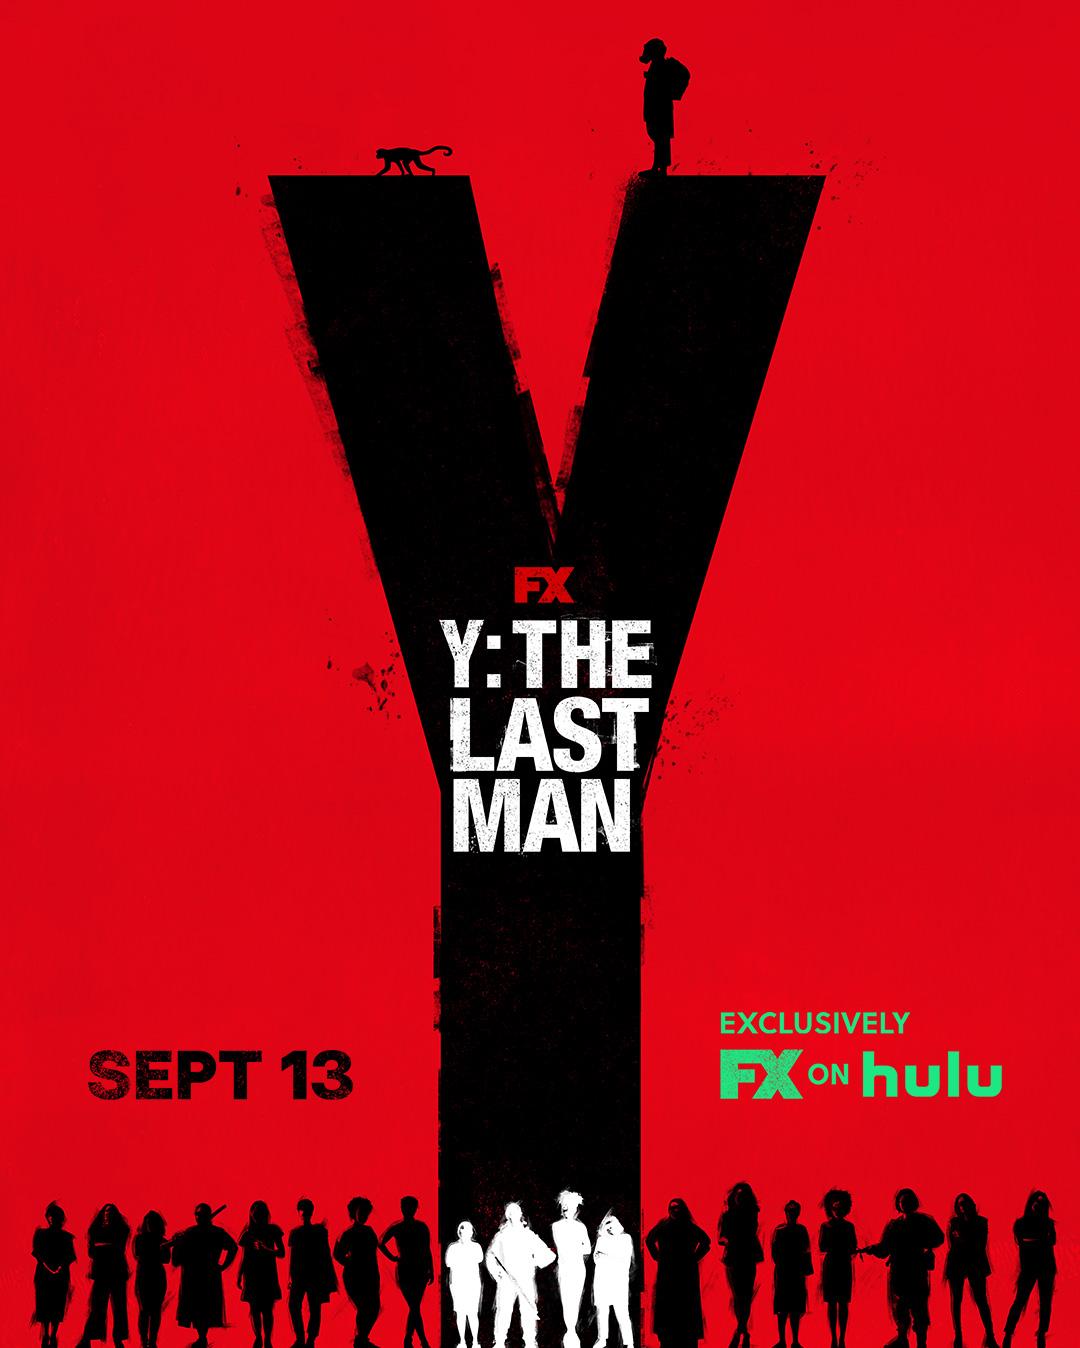 y-the-last-man.png